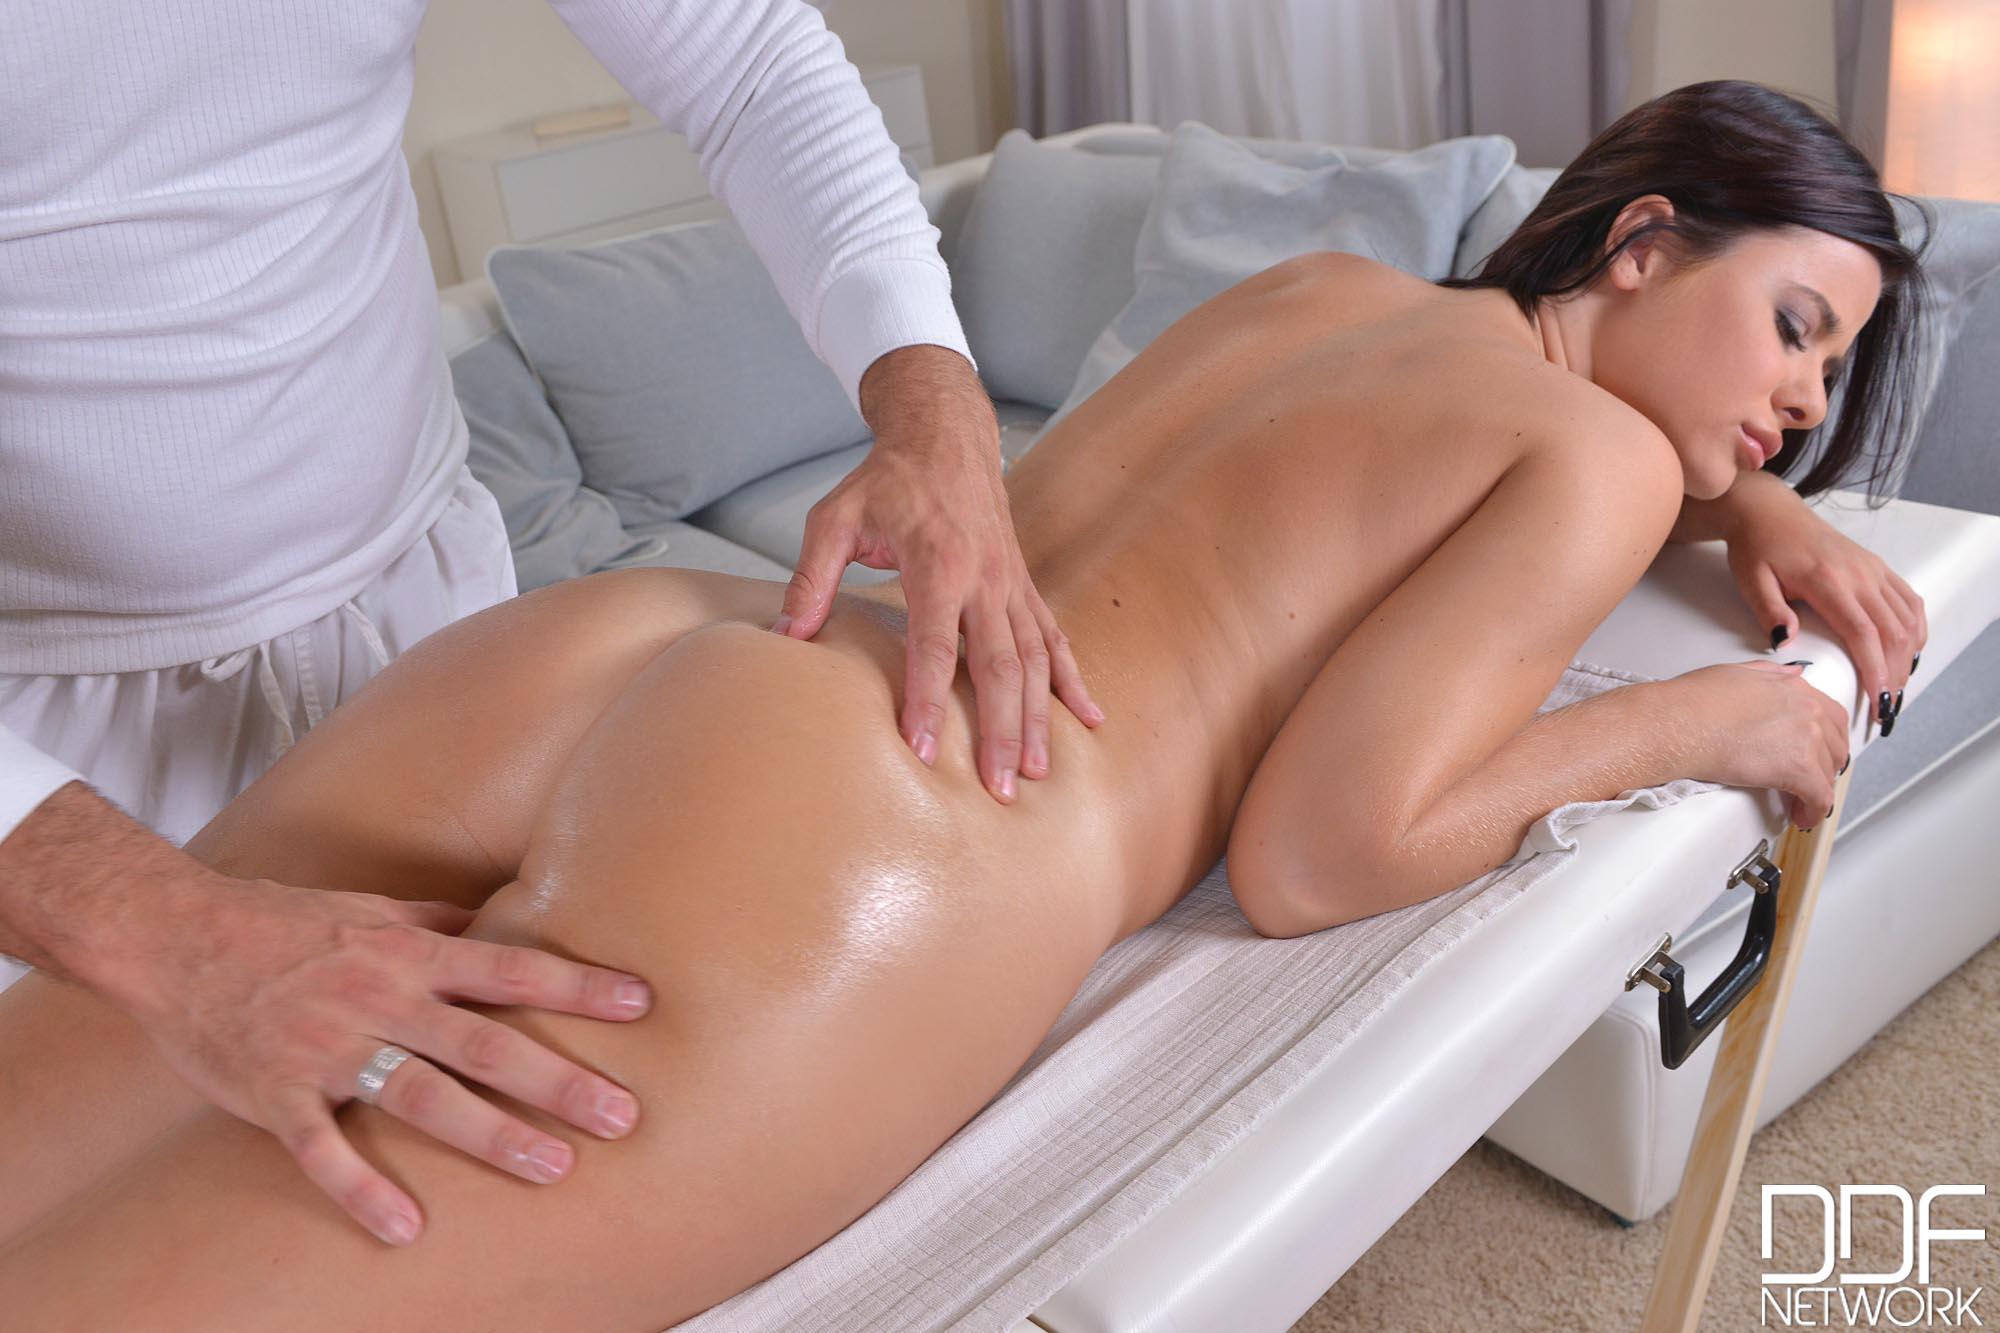 массажист клиентку жестко-оы1